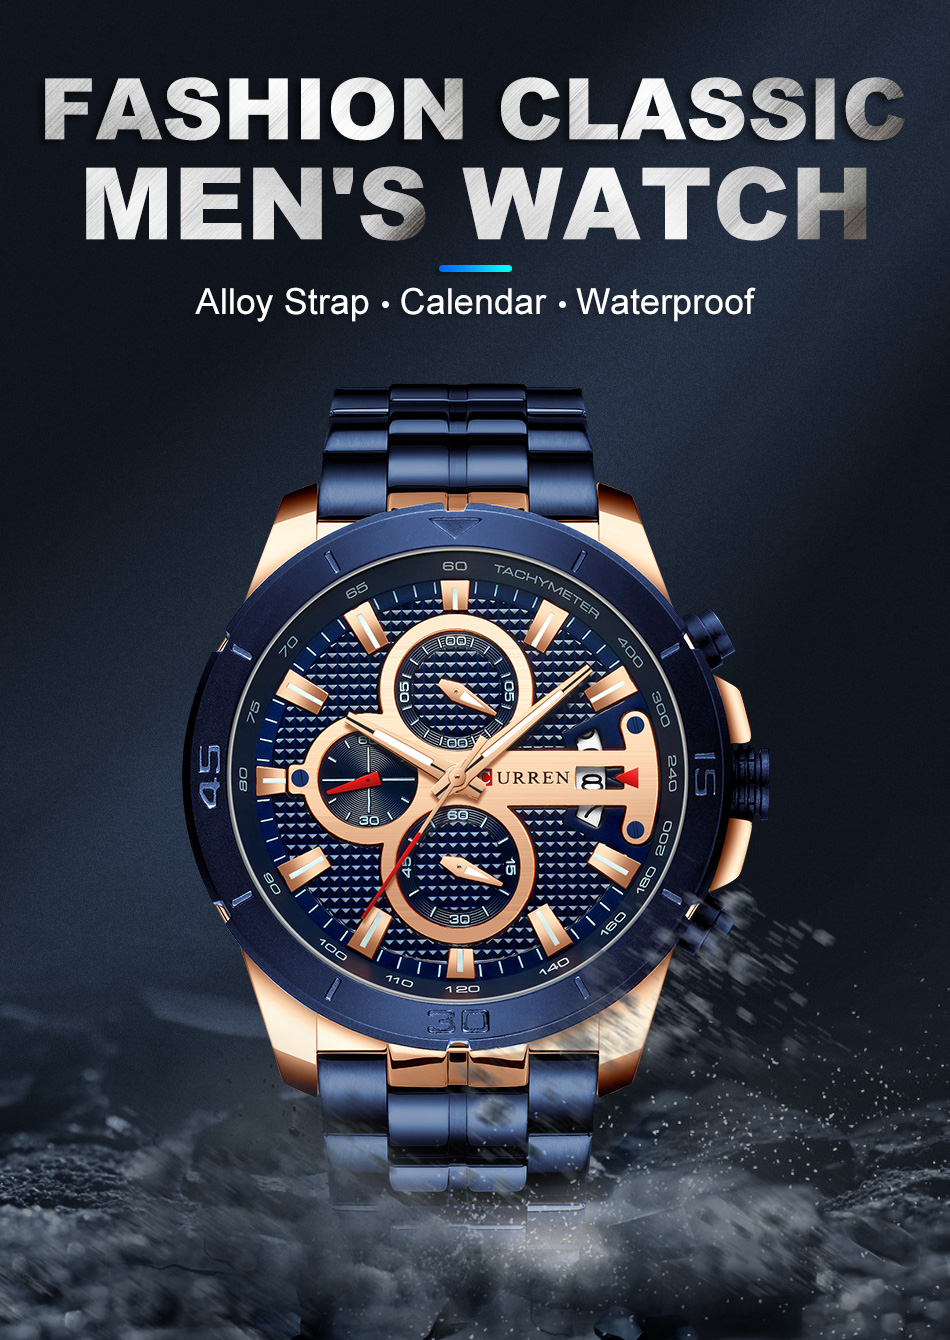 HTB1qW7hU7PoK1RjSZKbq6x1IXXaS CURREN Men Watch Luxury Watch Chronograph